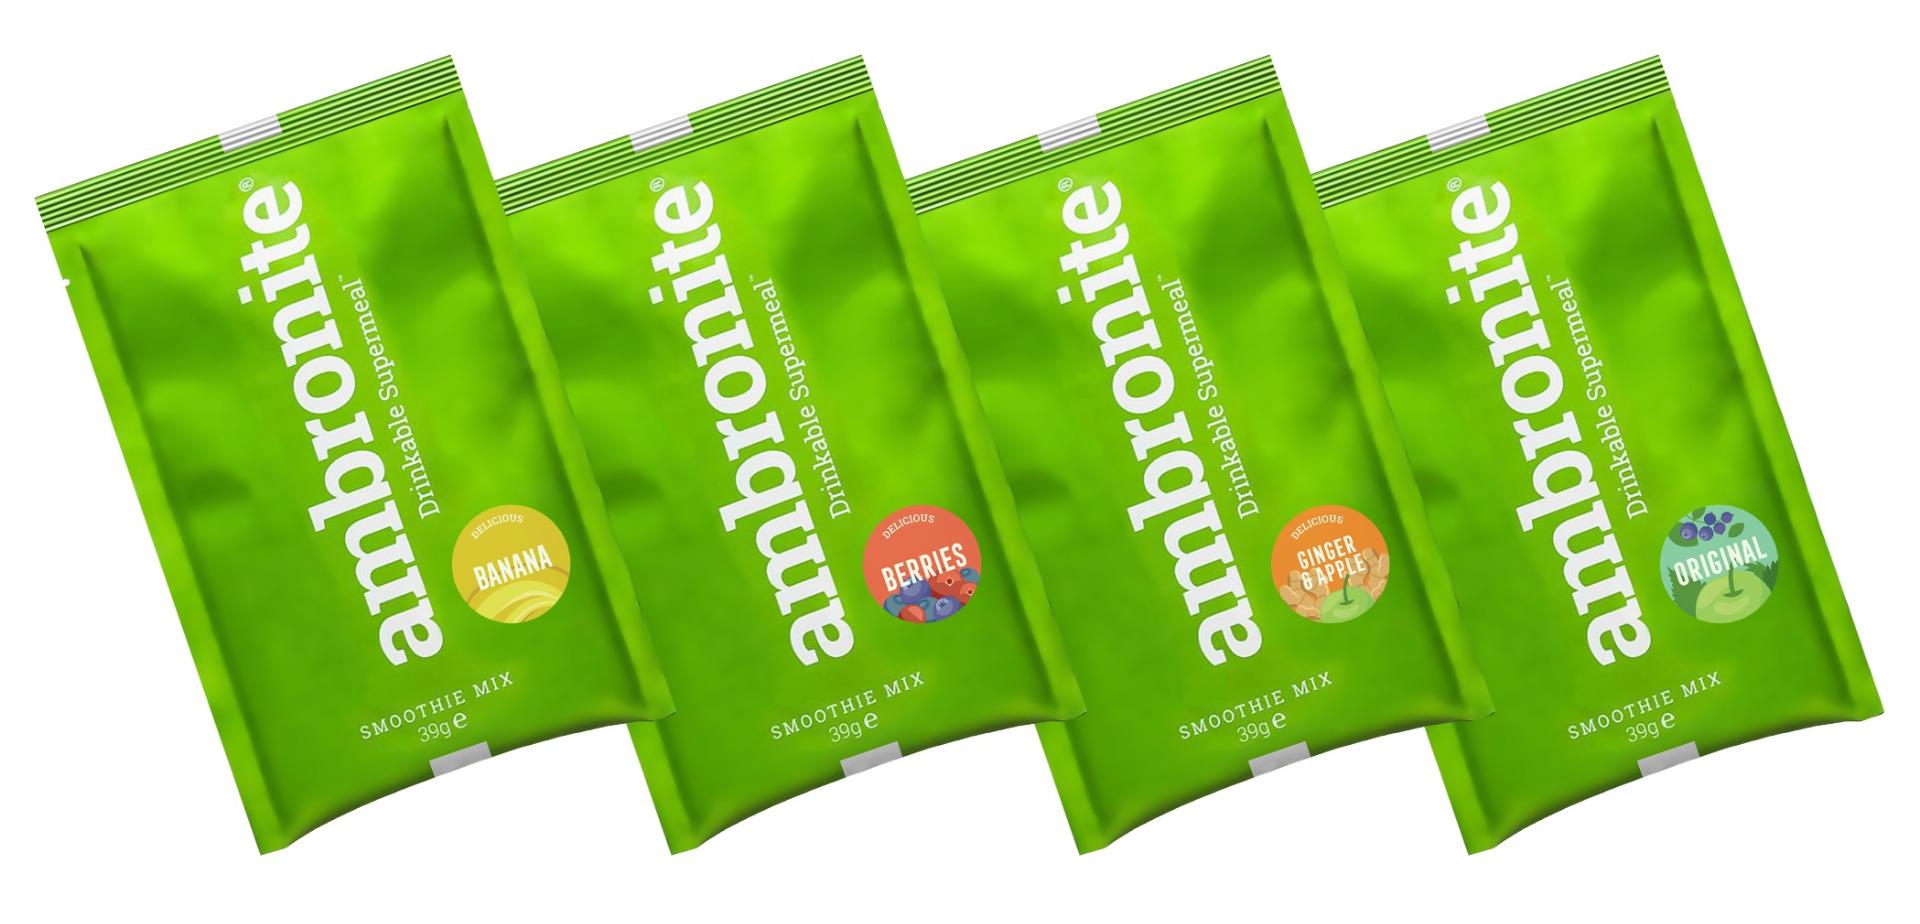 Ambronite Supermeal sample 4 x 165 kcal